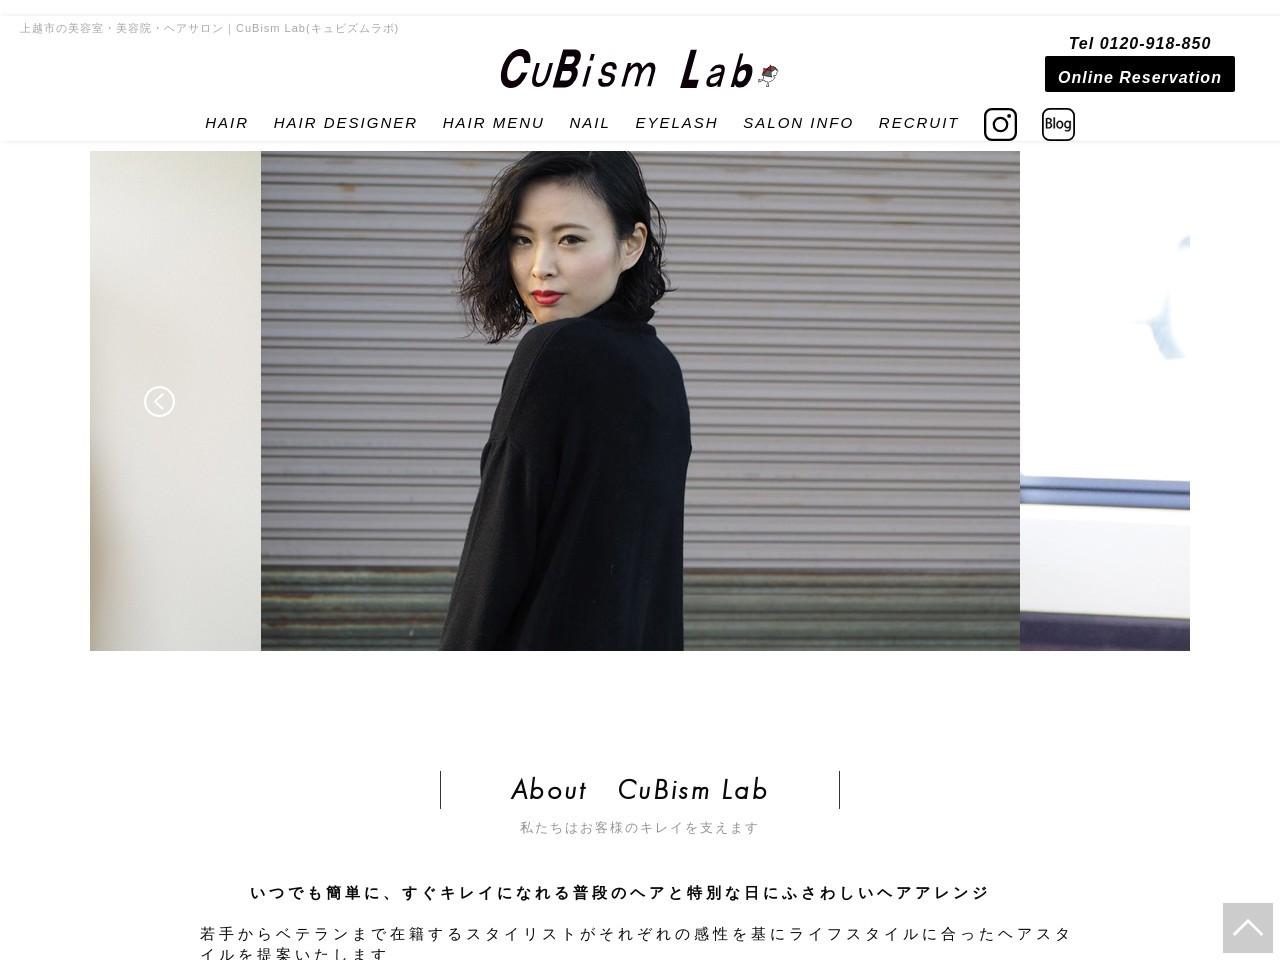 CuBism Lab